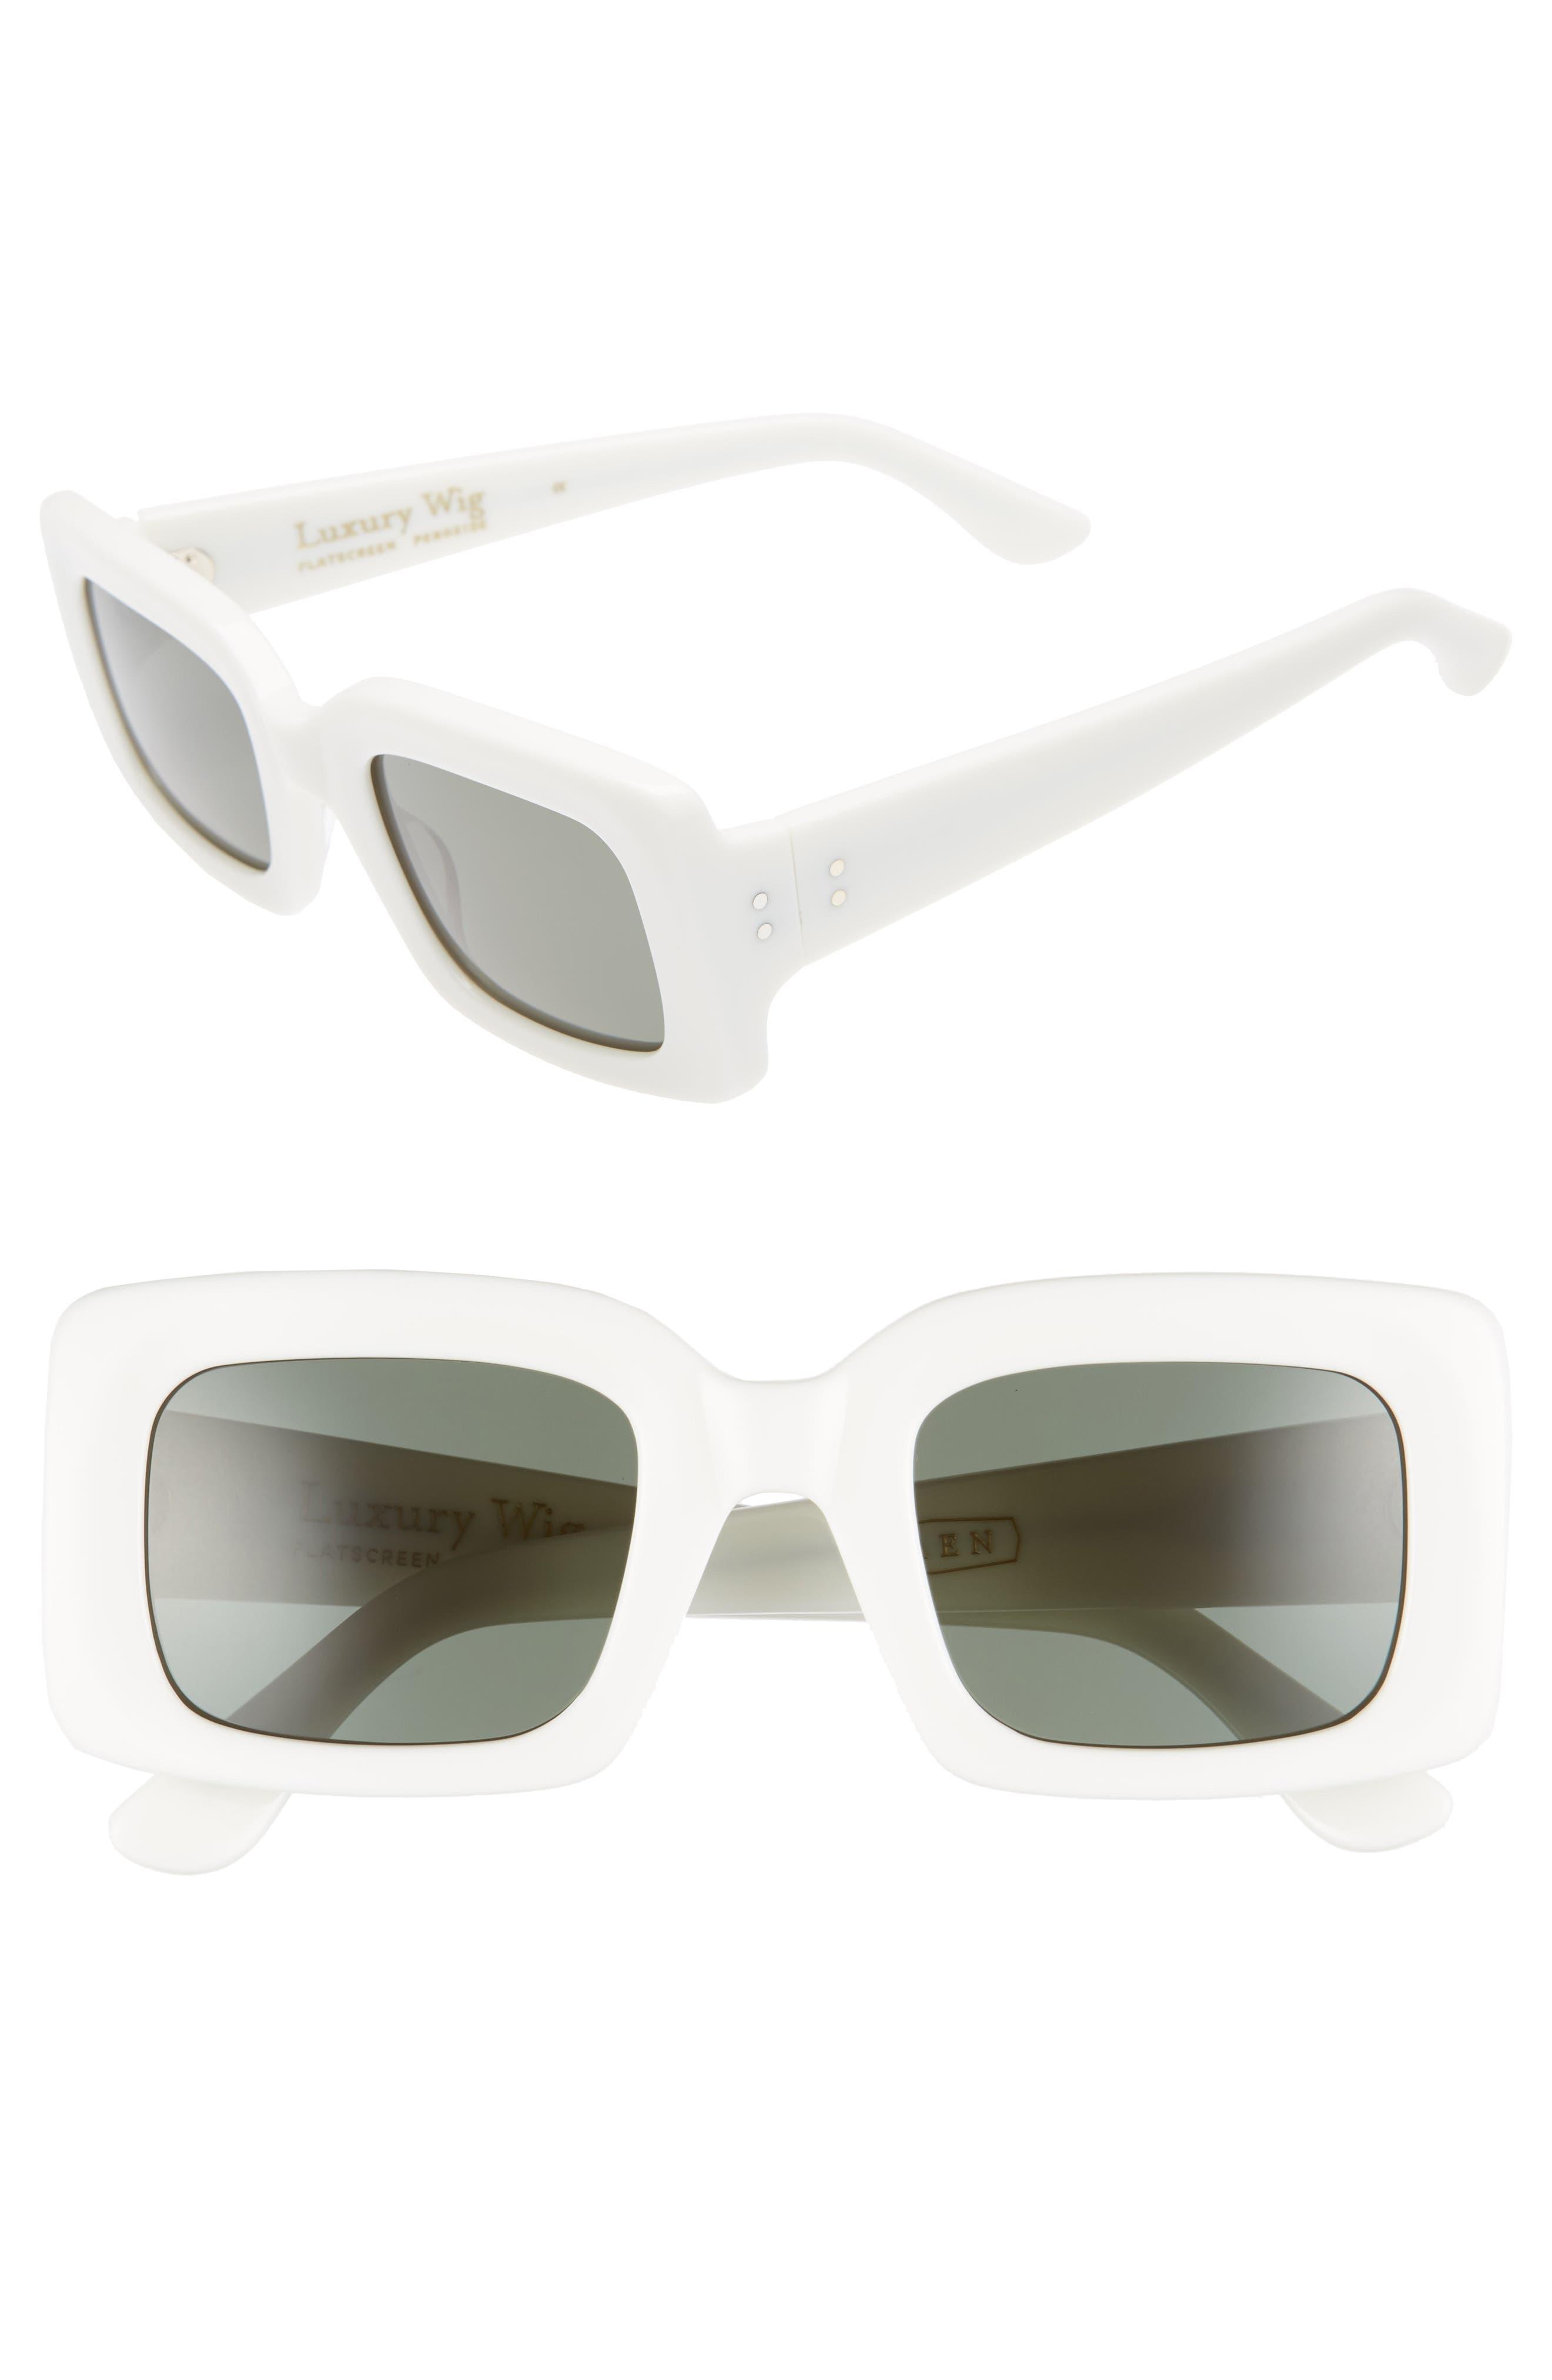 Main Image - RAEN x Alex Knost Luxury Wig Flatscreen 49mm Square Sunglasses